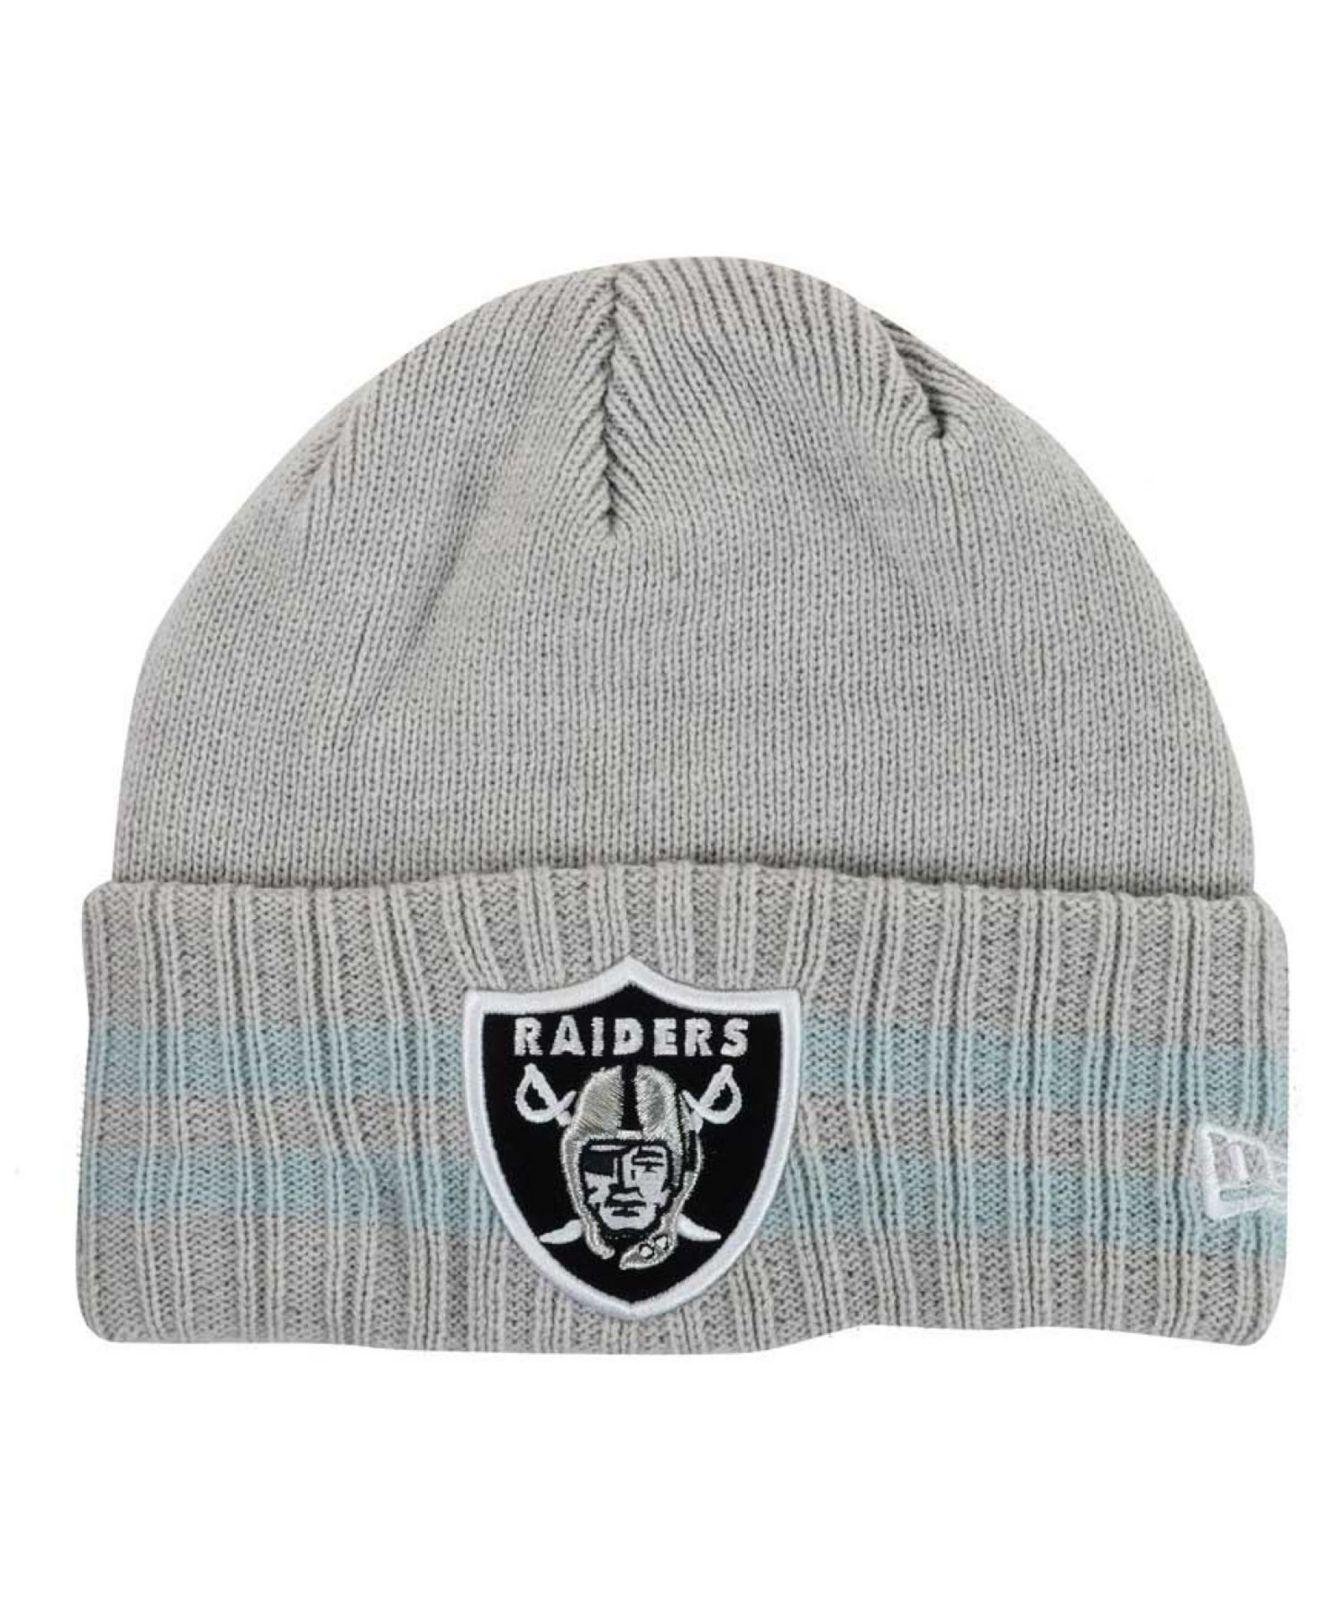 e5f88b3463f Lyst - KTZ Oakland Raiders Striped Cuff Knit Hat in Gray for Men